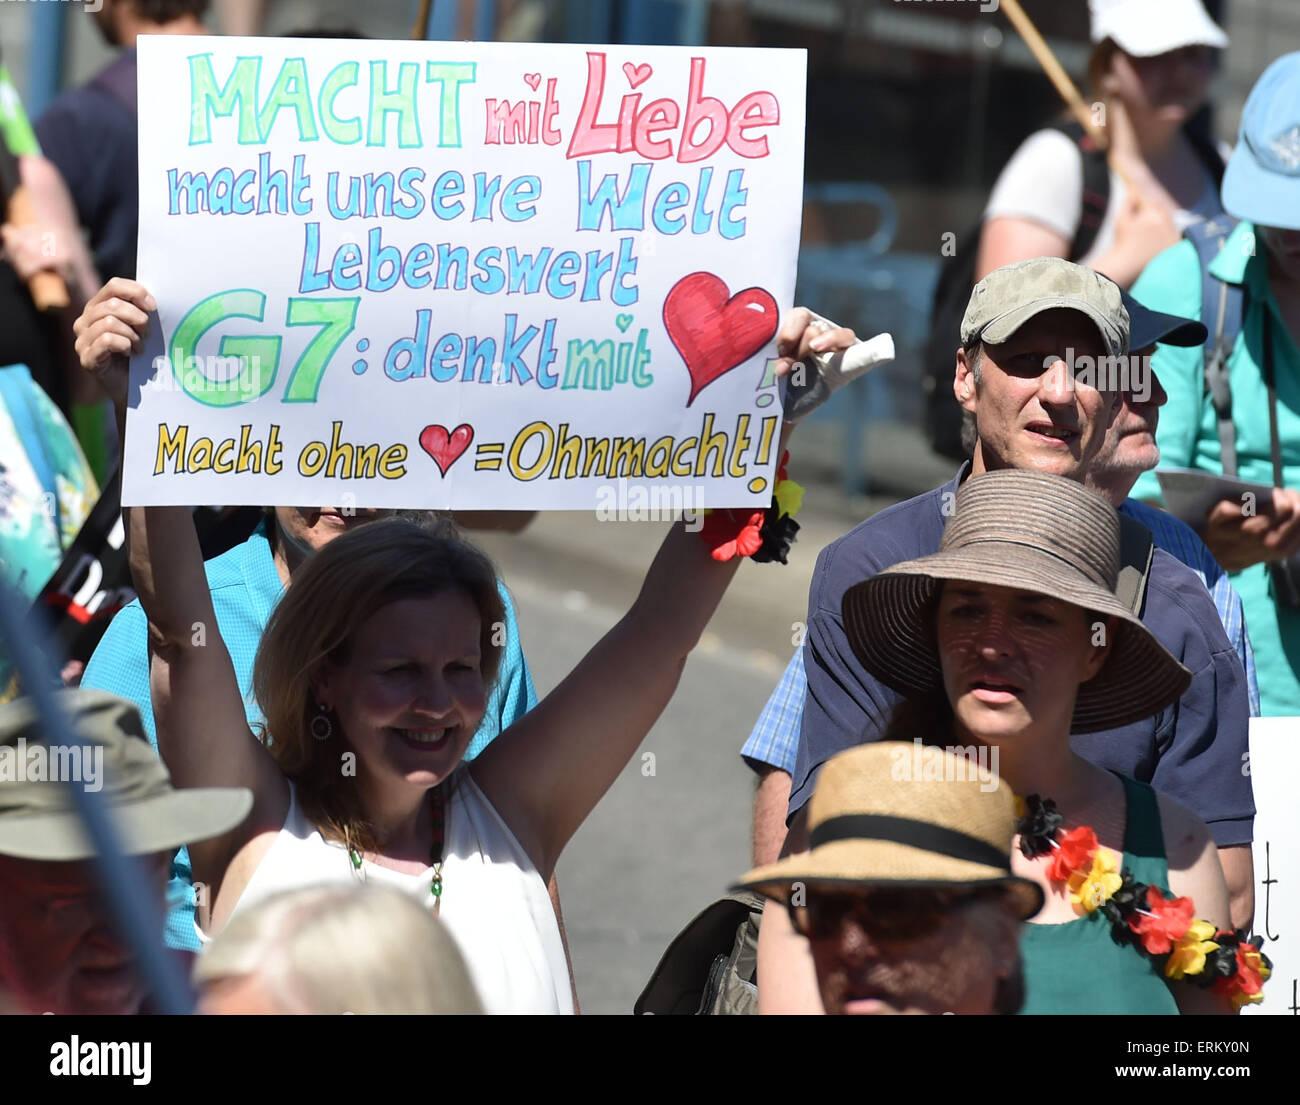 Munich, Germany. 04th June, 2015. Demonstrators hold a sign reading 'Macht mit Liebe - macht unsere Welt lebenswert; Stock Photo